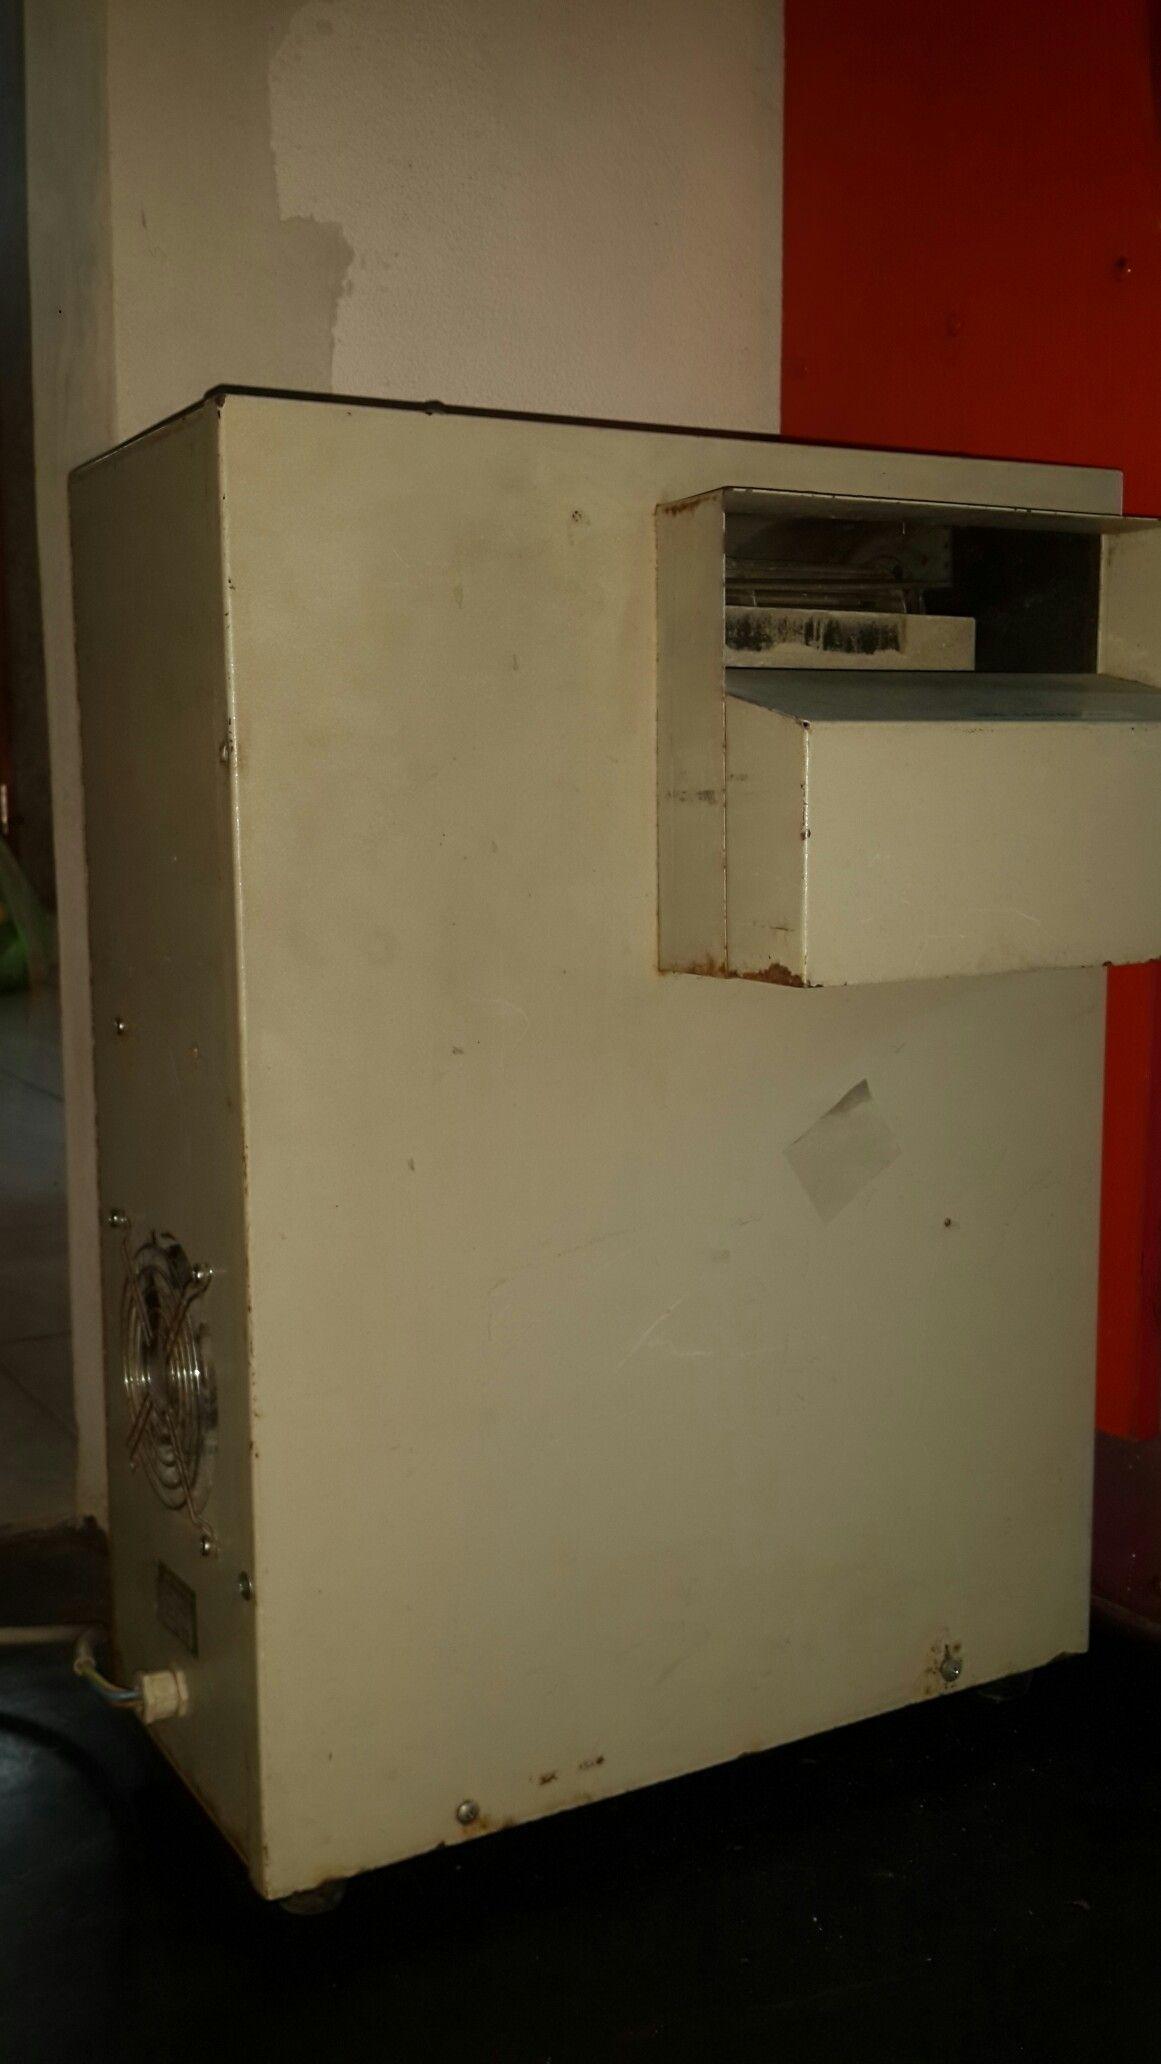 Aire acondicionado para casa rodante o motorhome. 1500